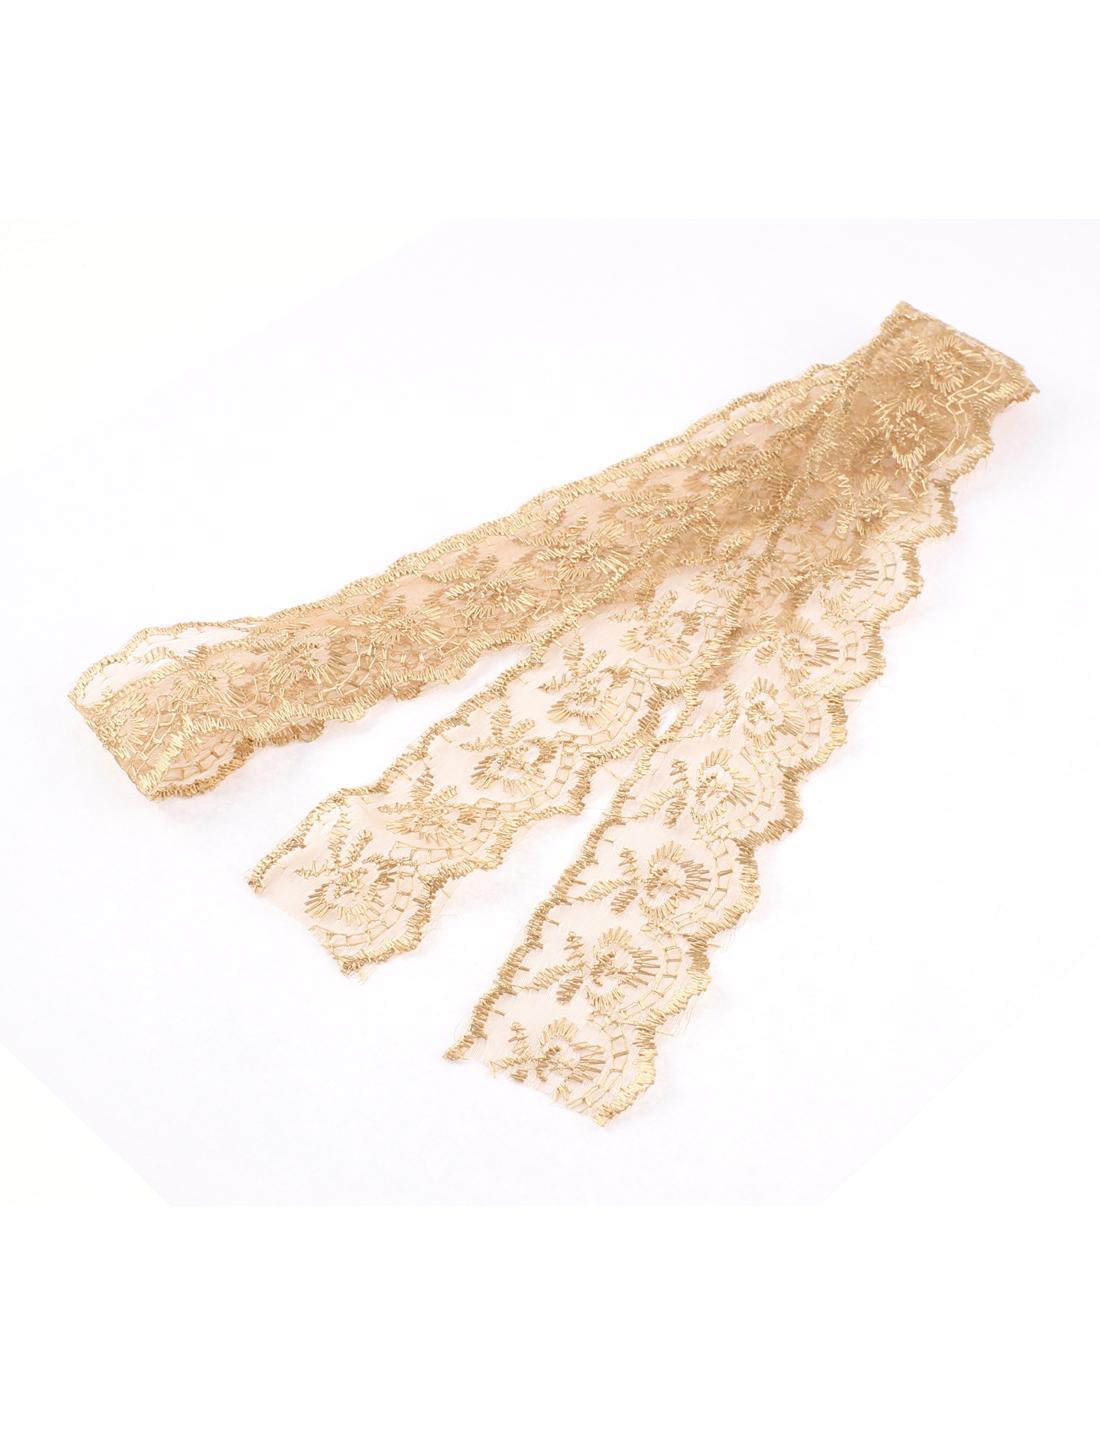 Dress Making Bridal Wedding Lace Trim Ribbon Brown 4cm Width 1M Long